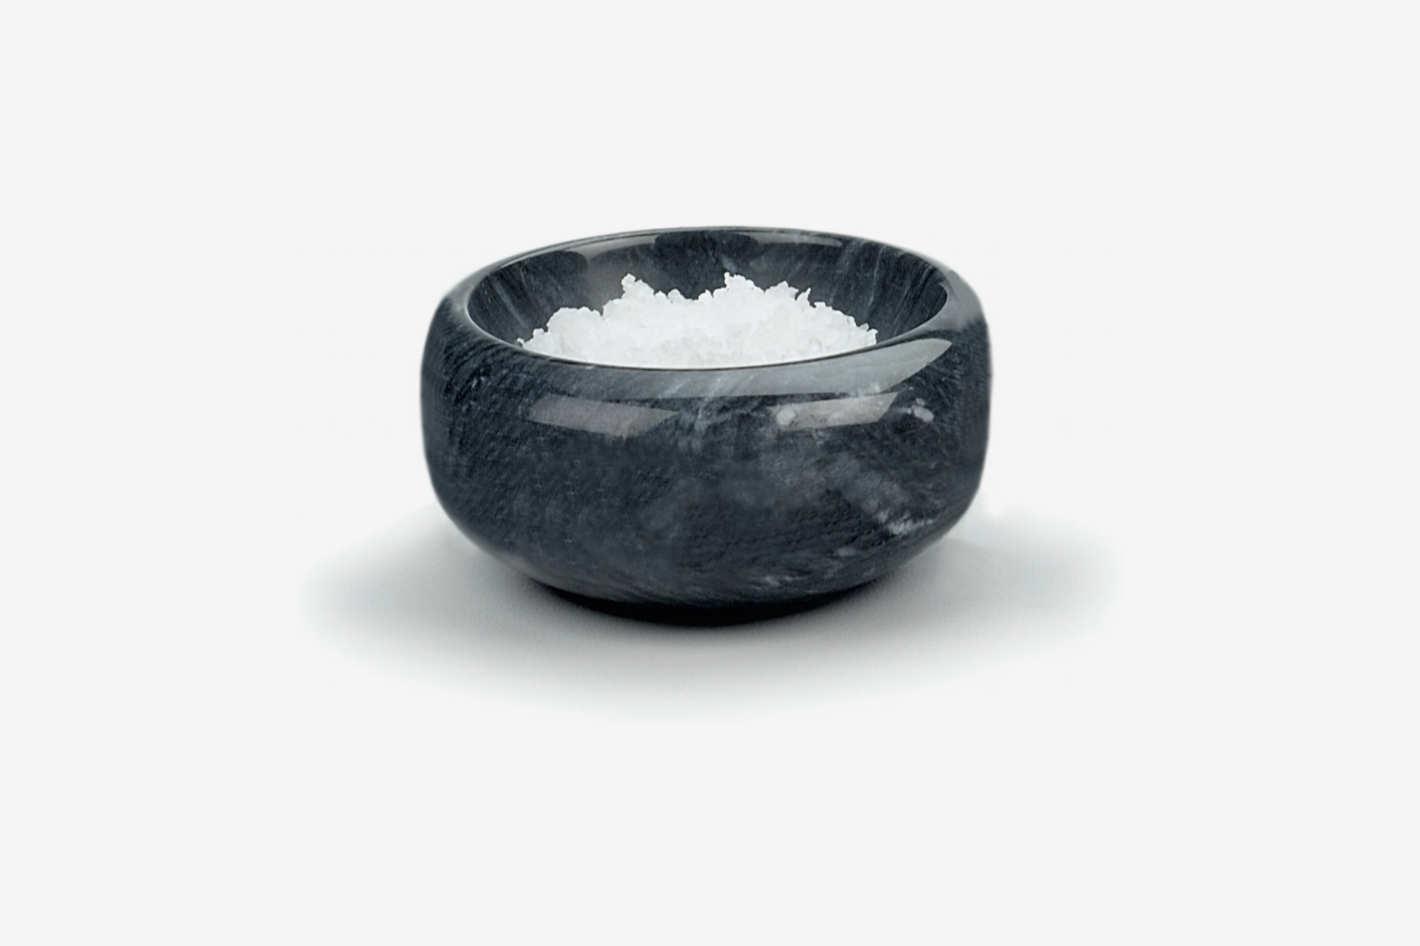 RSVP INTERNATIONAL Marble Herb & Salt Bowl